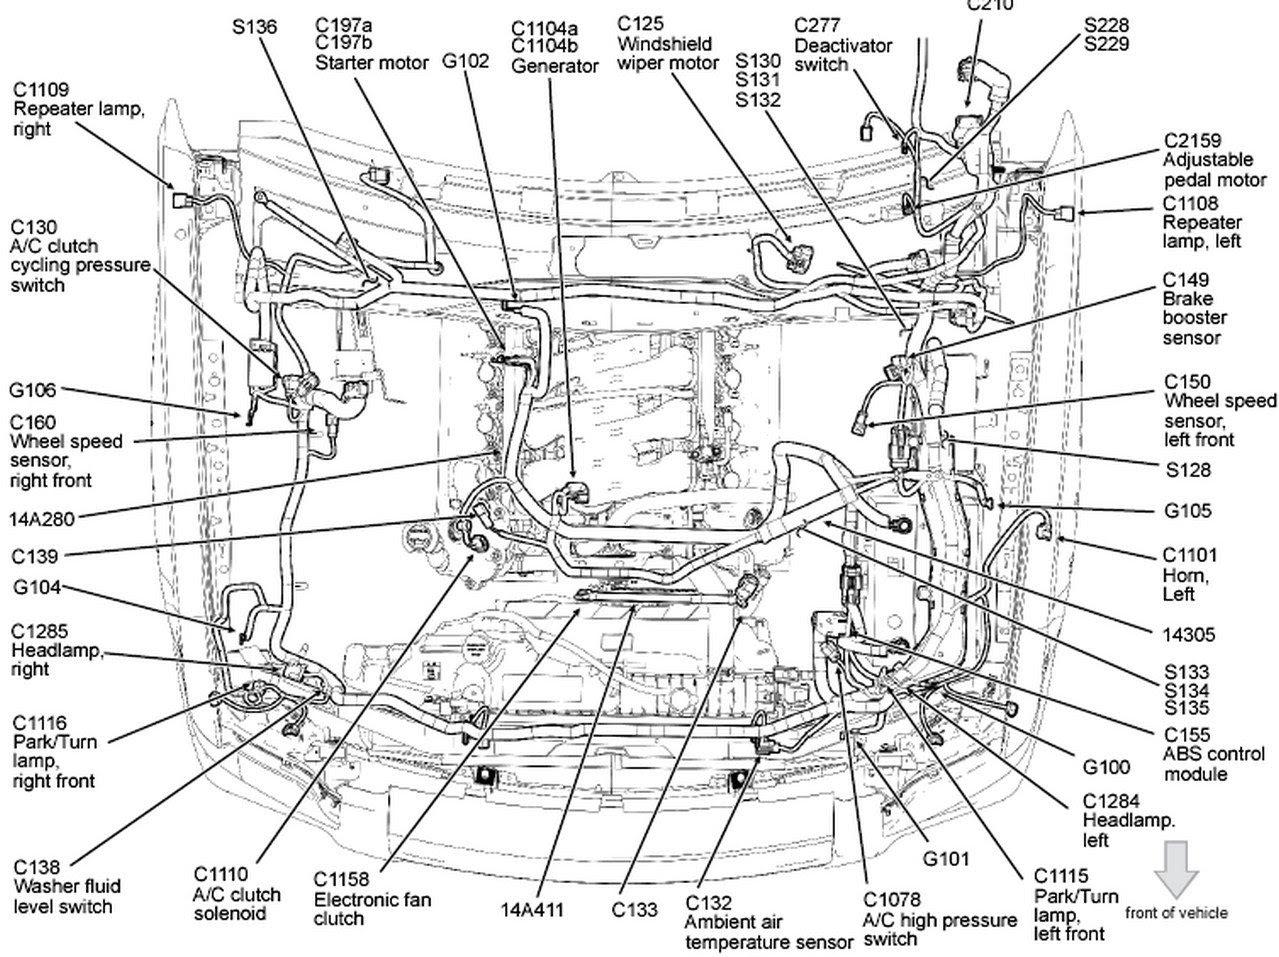 2002 Ford Explorer Engine Diagram 2wire Prox Switch Diagram Tomosa35 Jeep Wrangler Waystar Fr